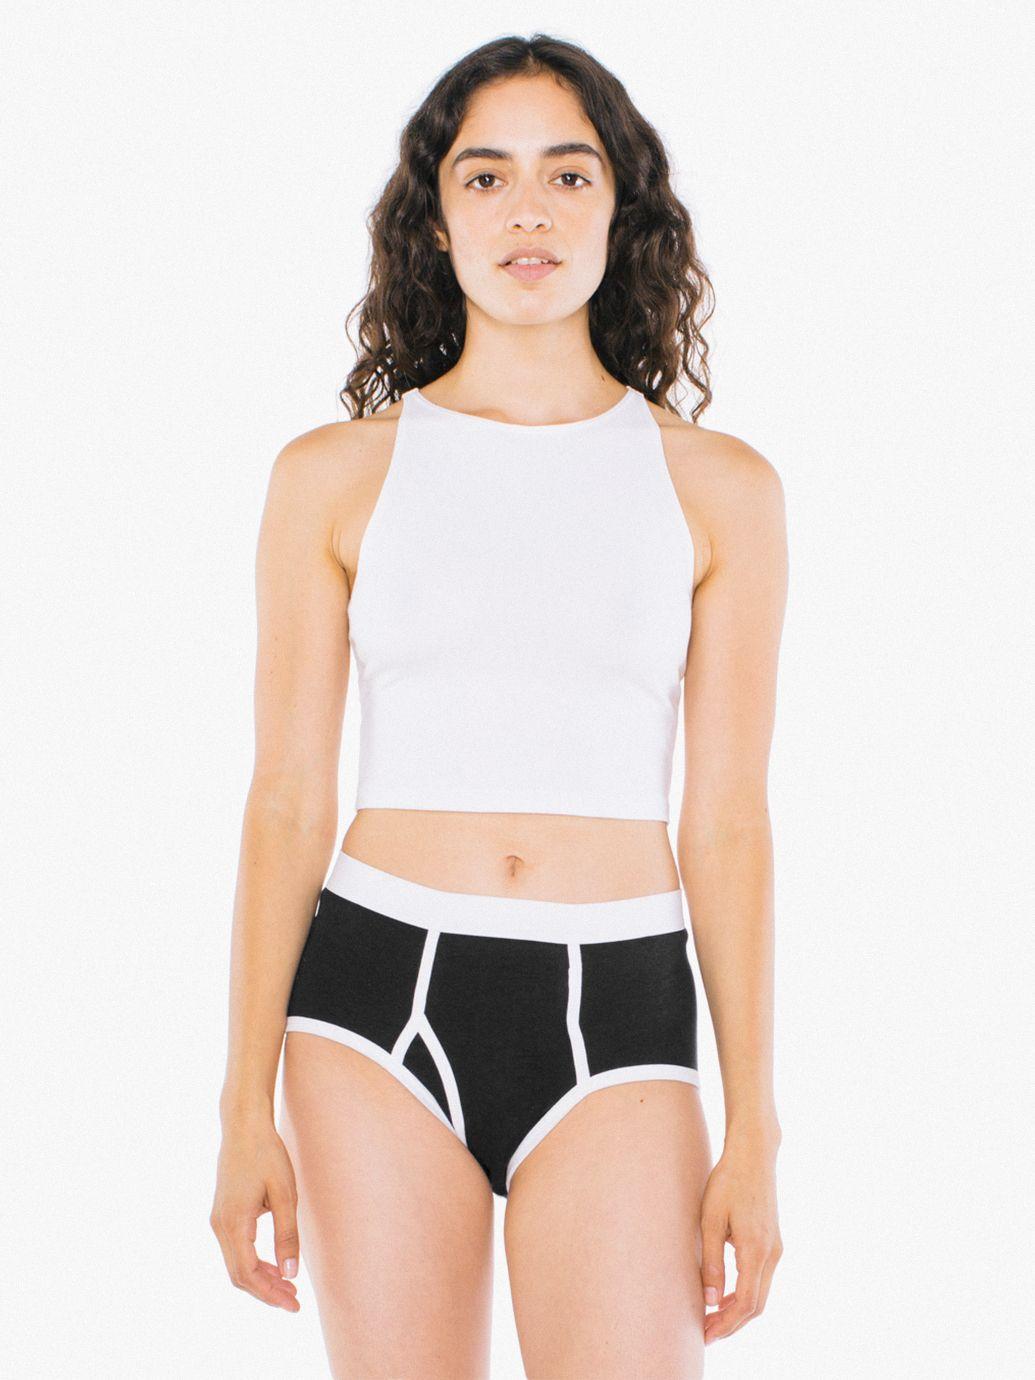 apparel models American underwear